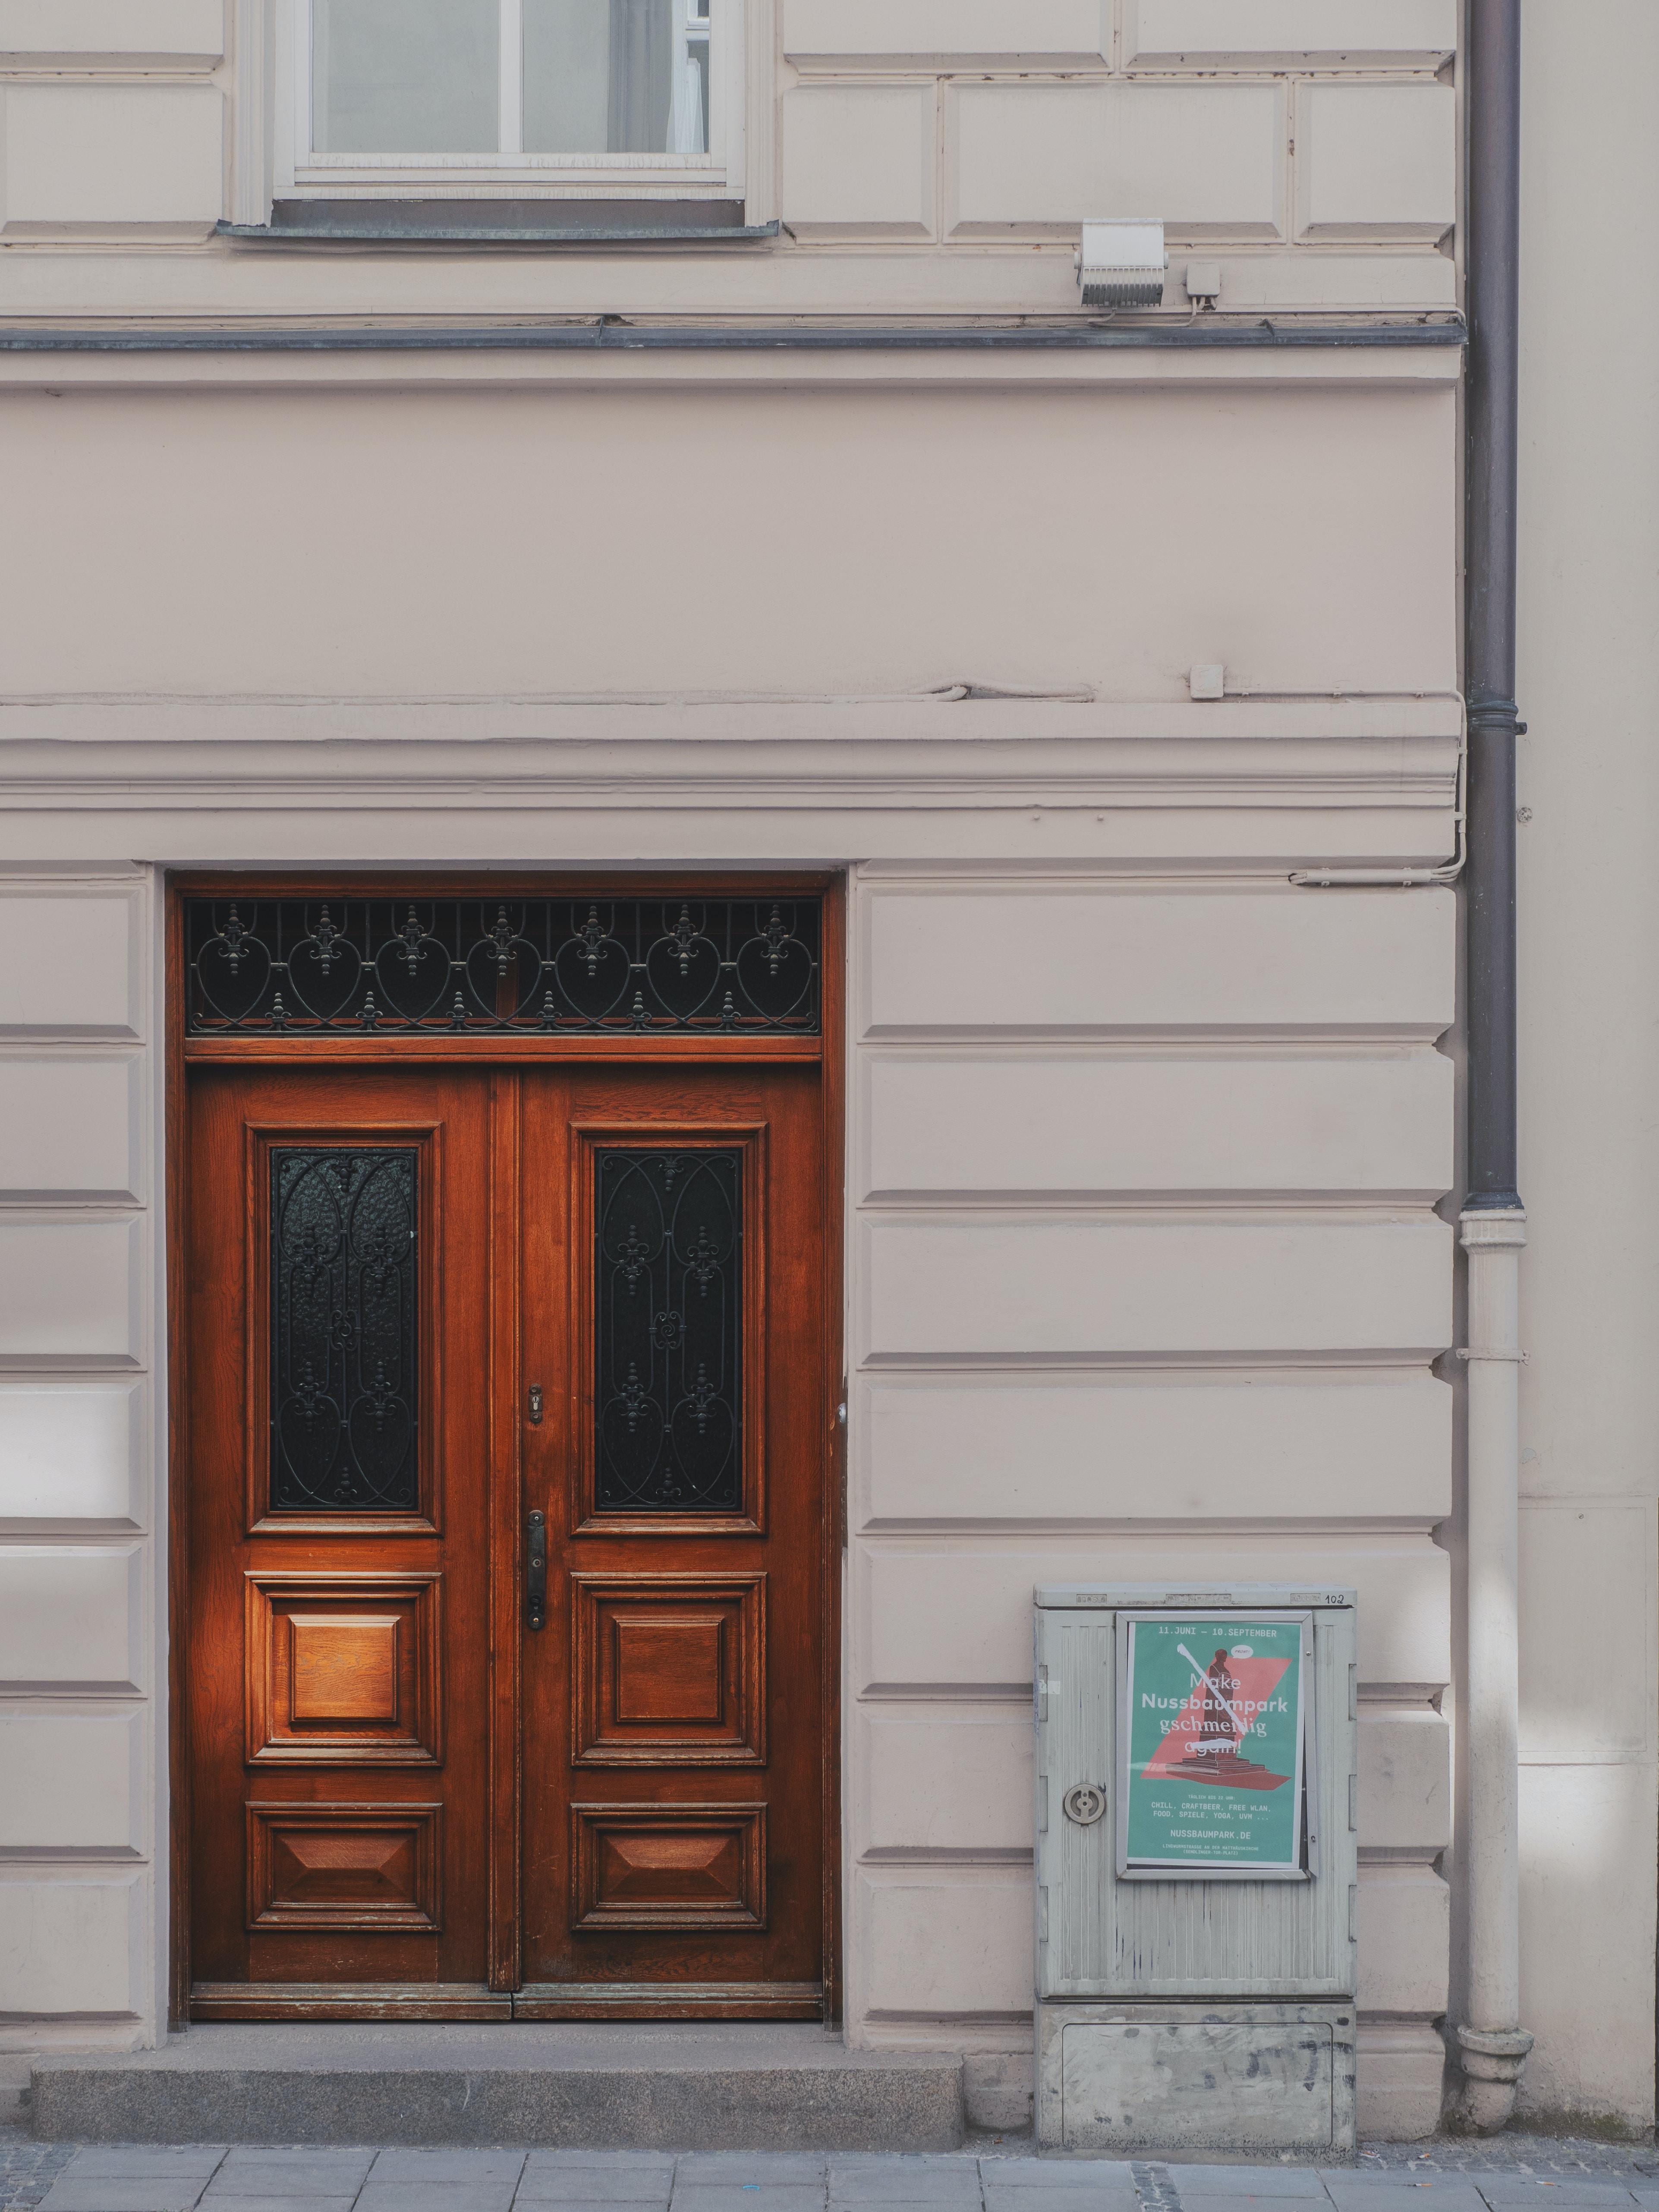 brown wooden door in white building at daytime